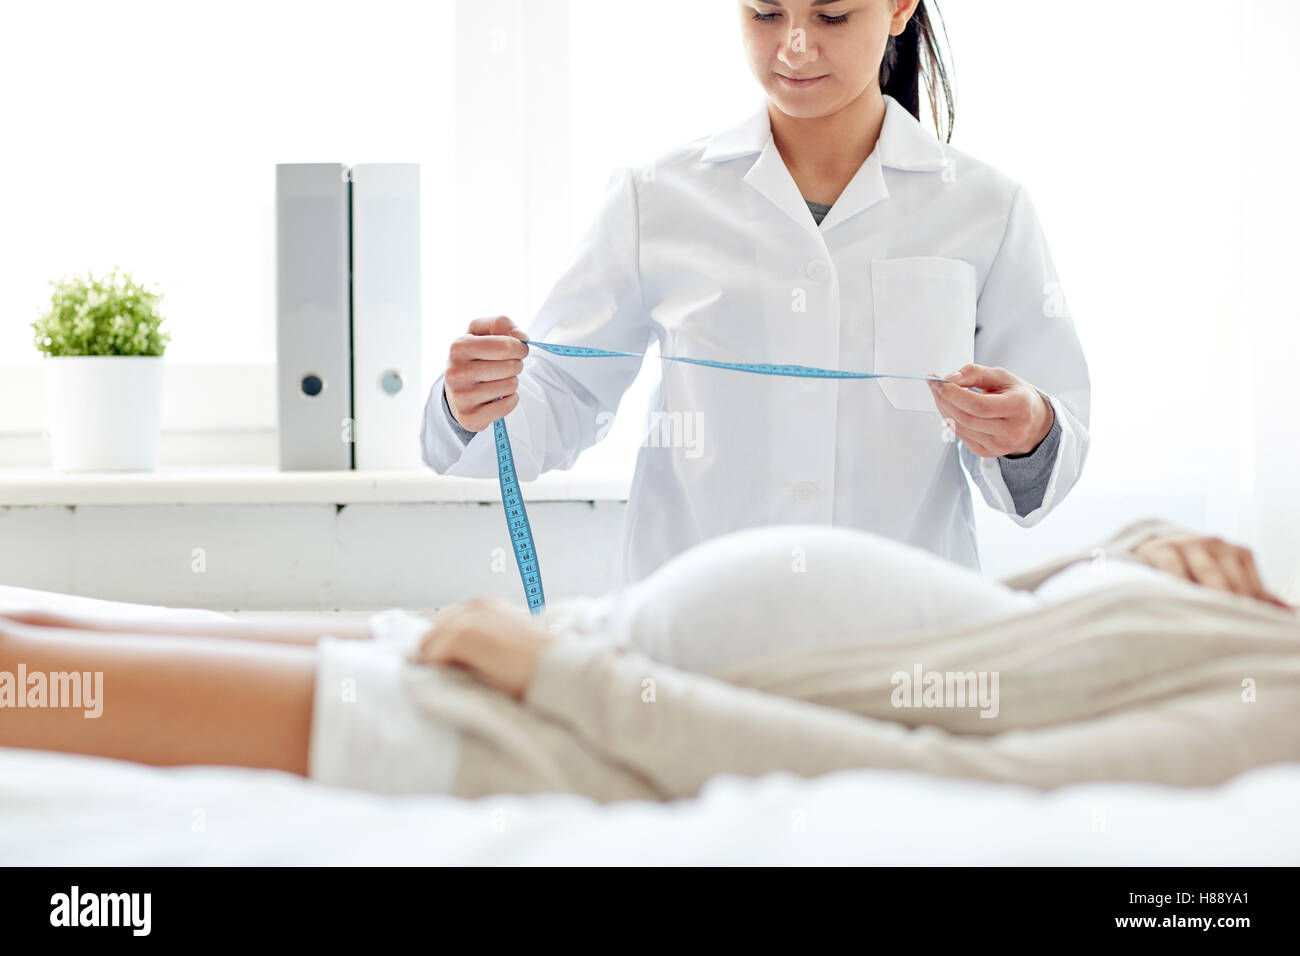 gynecology exam stockfotos gynecology exam bilder. Black Bedroom Furniture Sets. Home Design Ideas